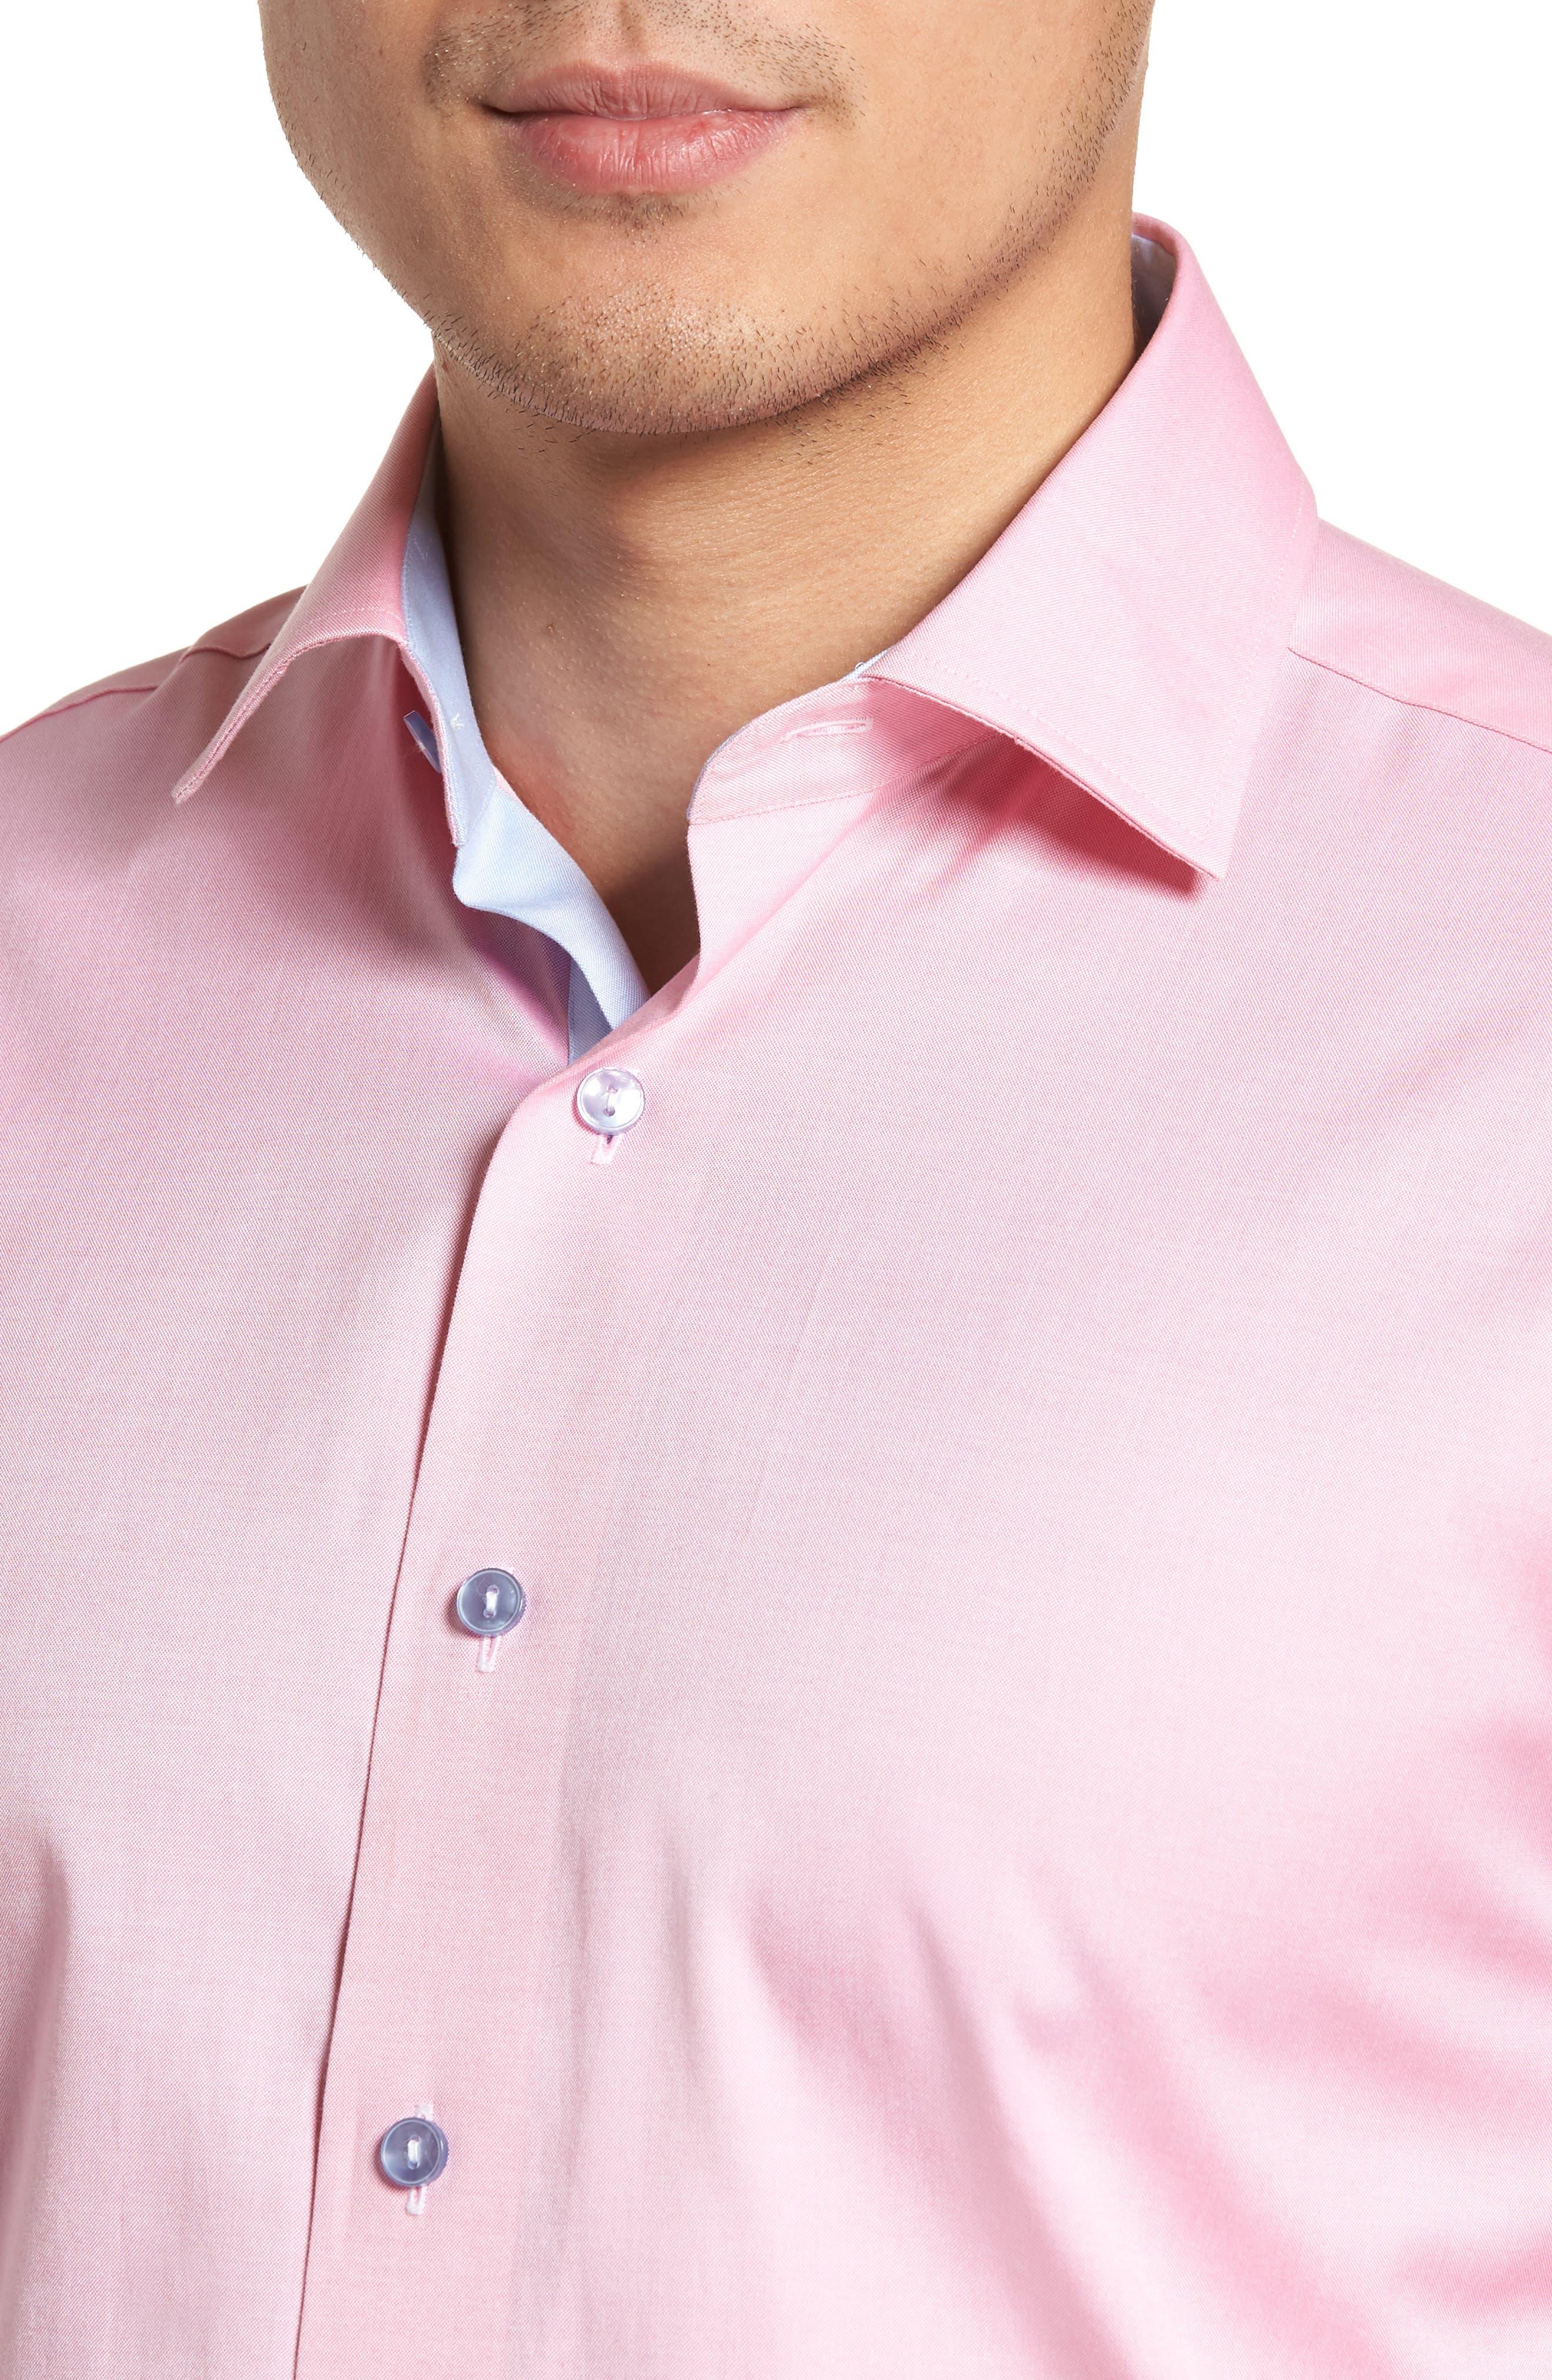 Trim Fit Oxford Dress Shirt,                             Alternate thumbnail 2, color,                             PINK